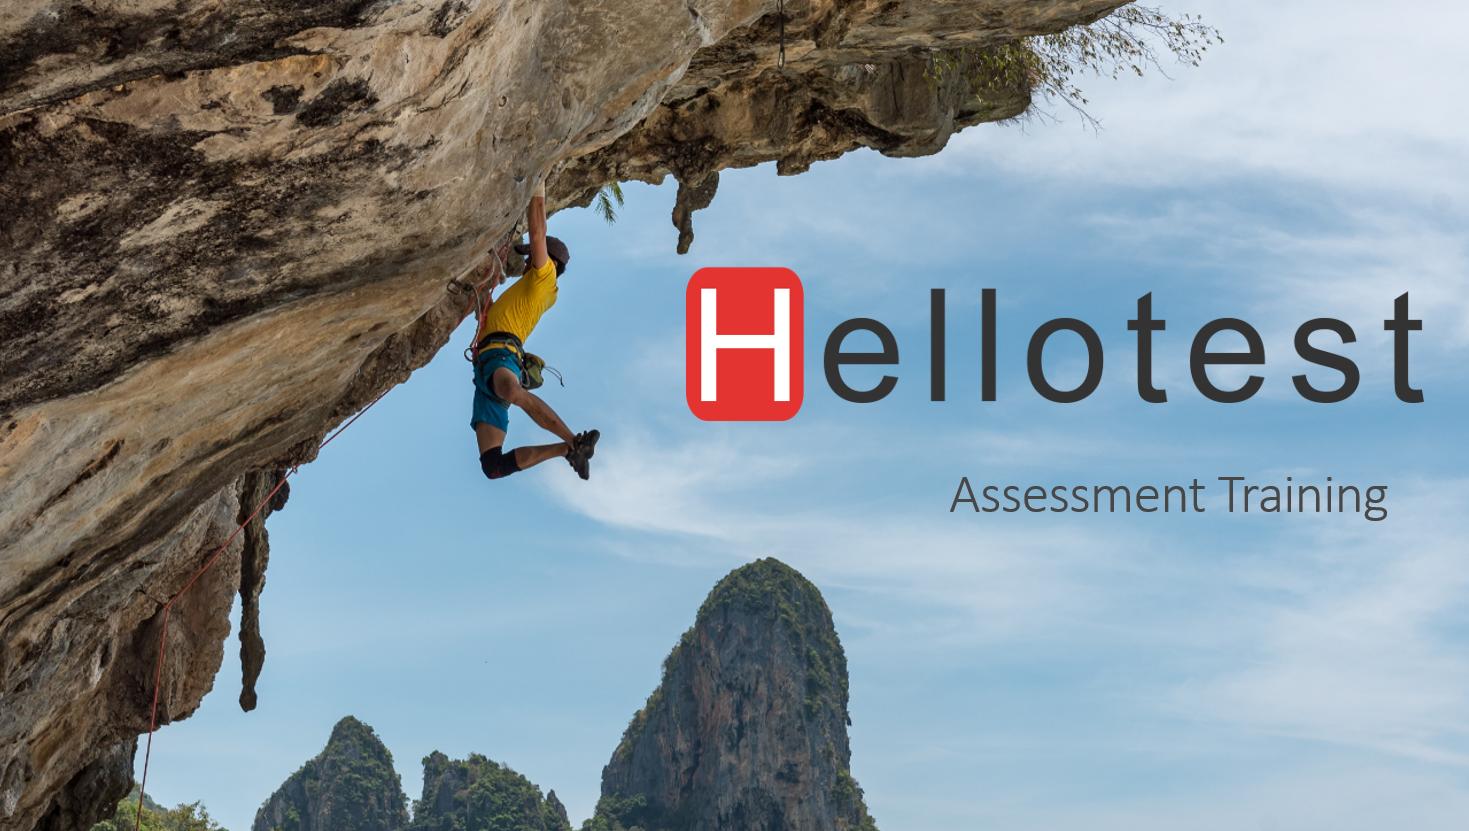 Assessment Training door Hellotest